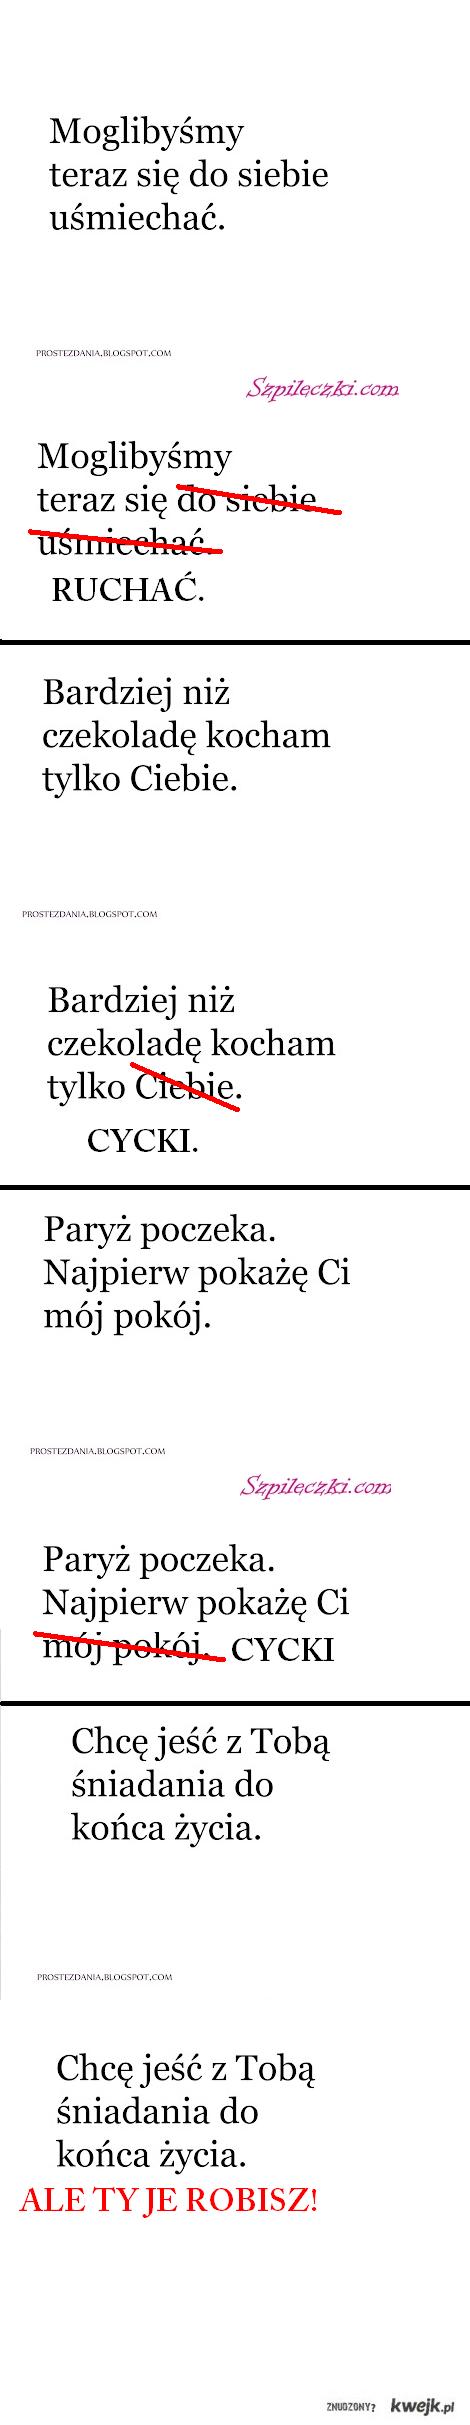 Szpileczki level over 9000